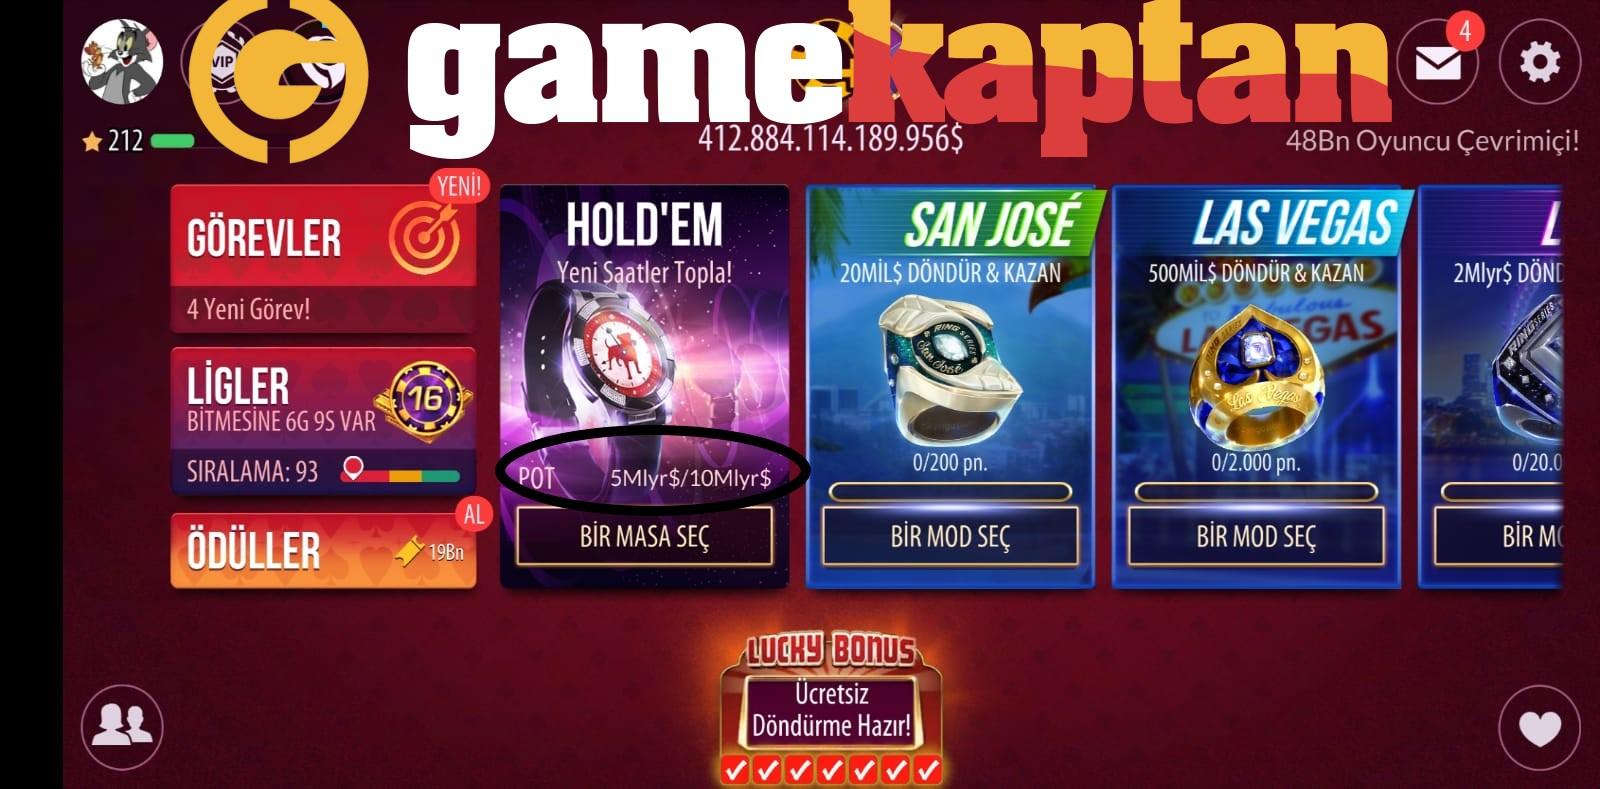 gamekaptan.com